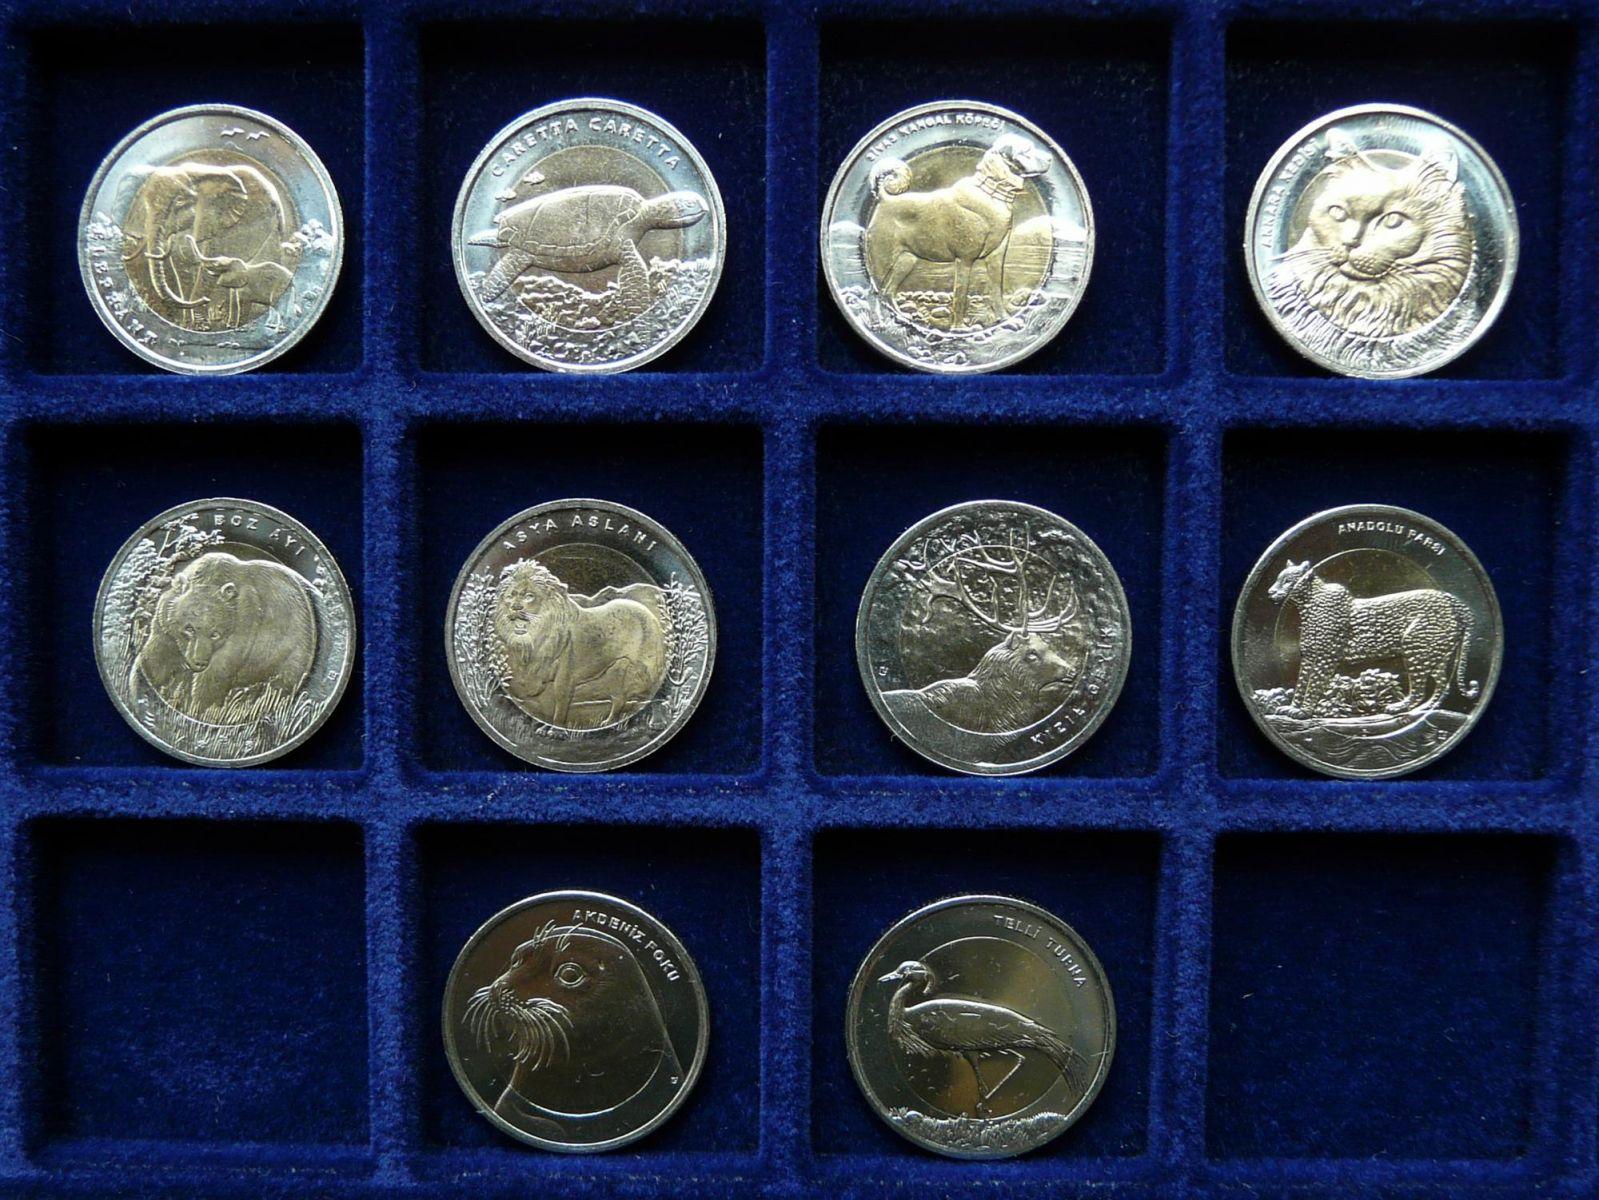 1 Lira Turkey